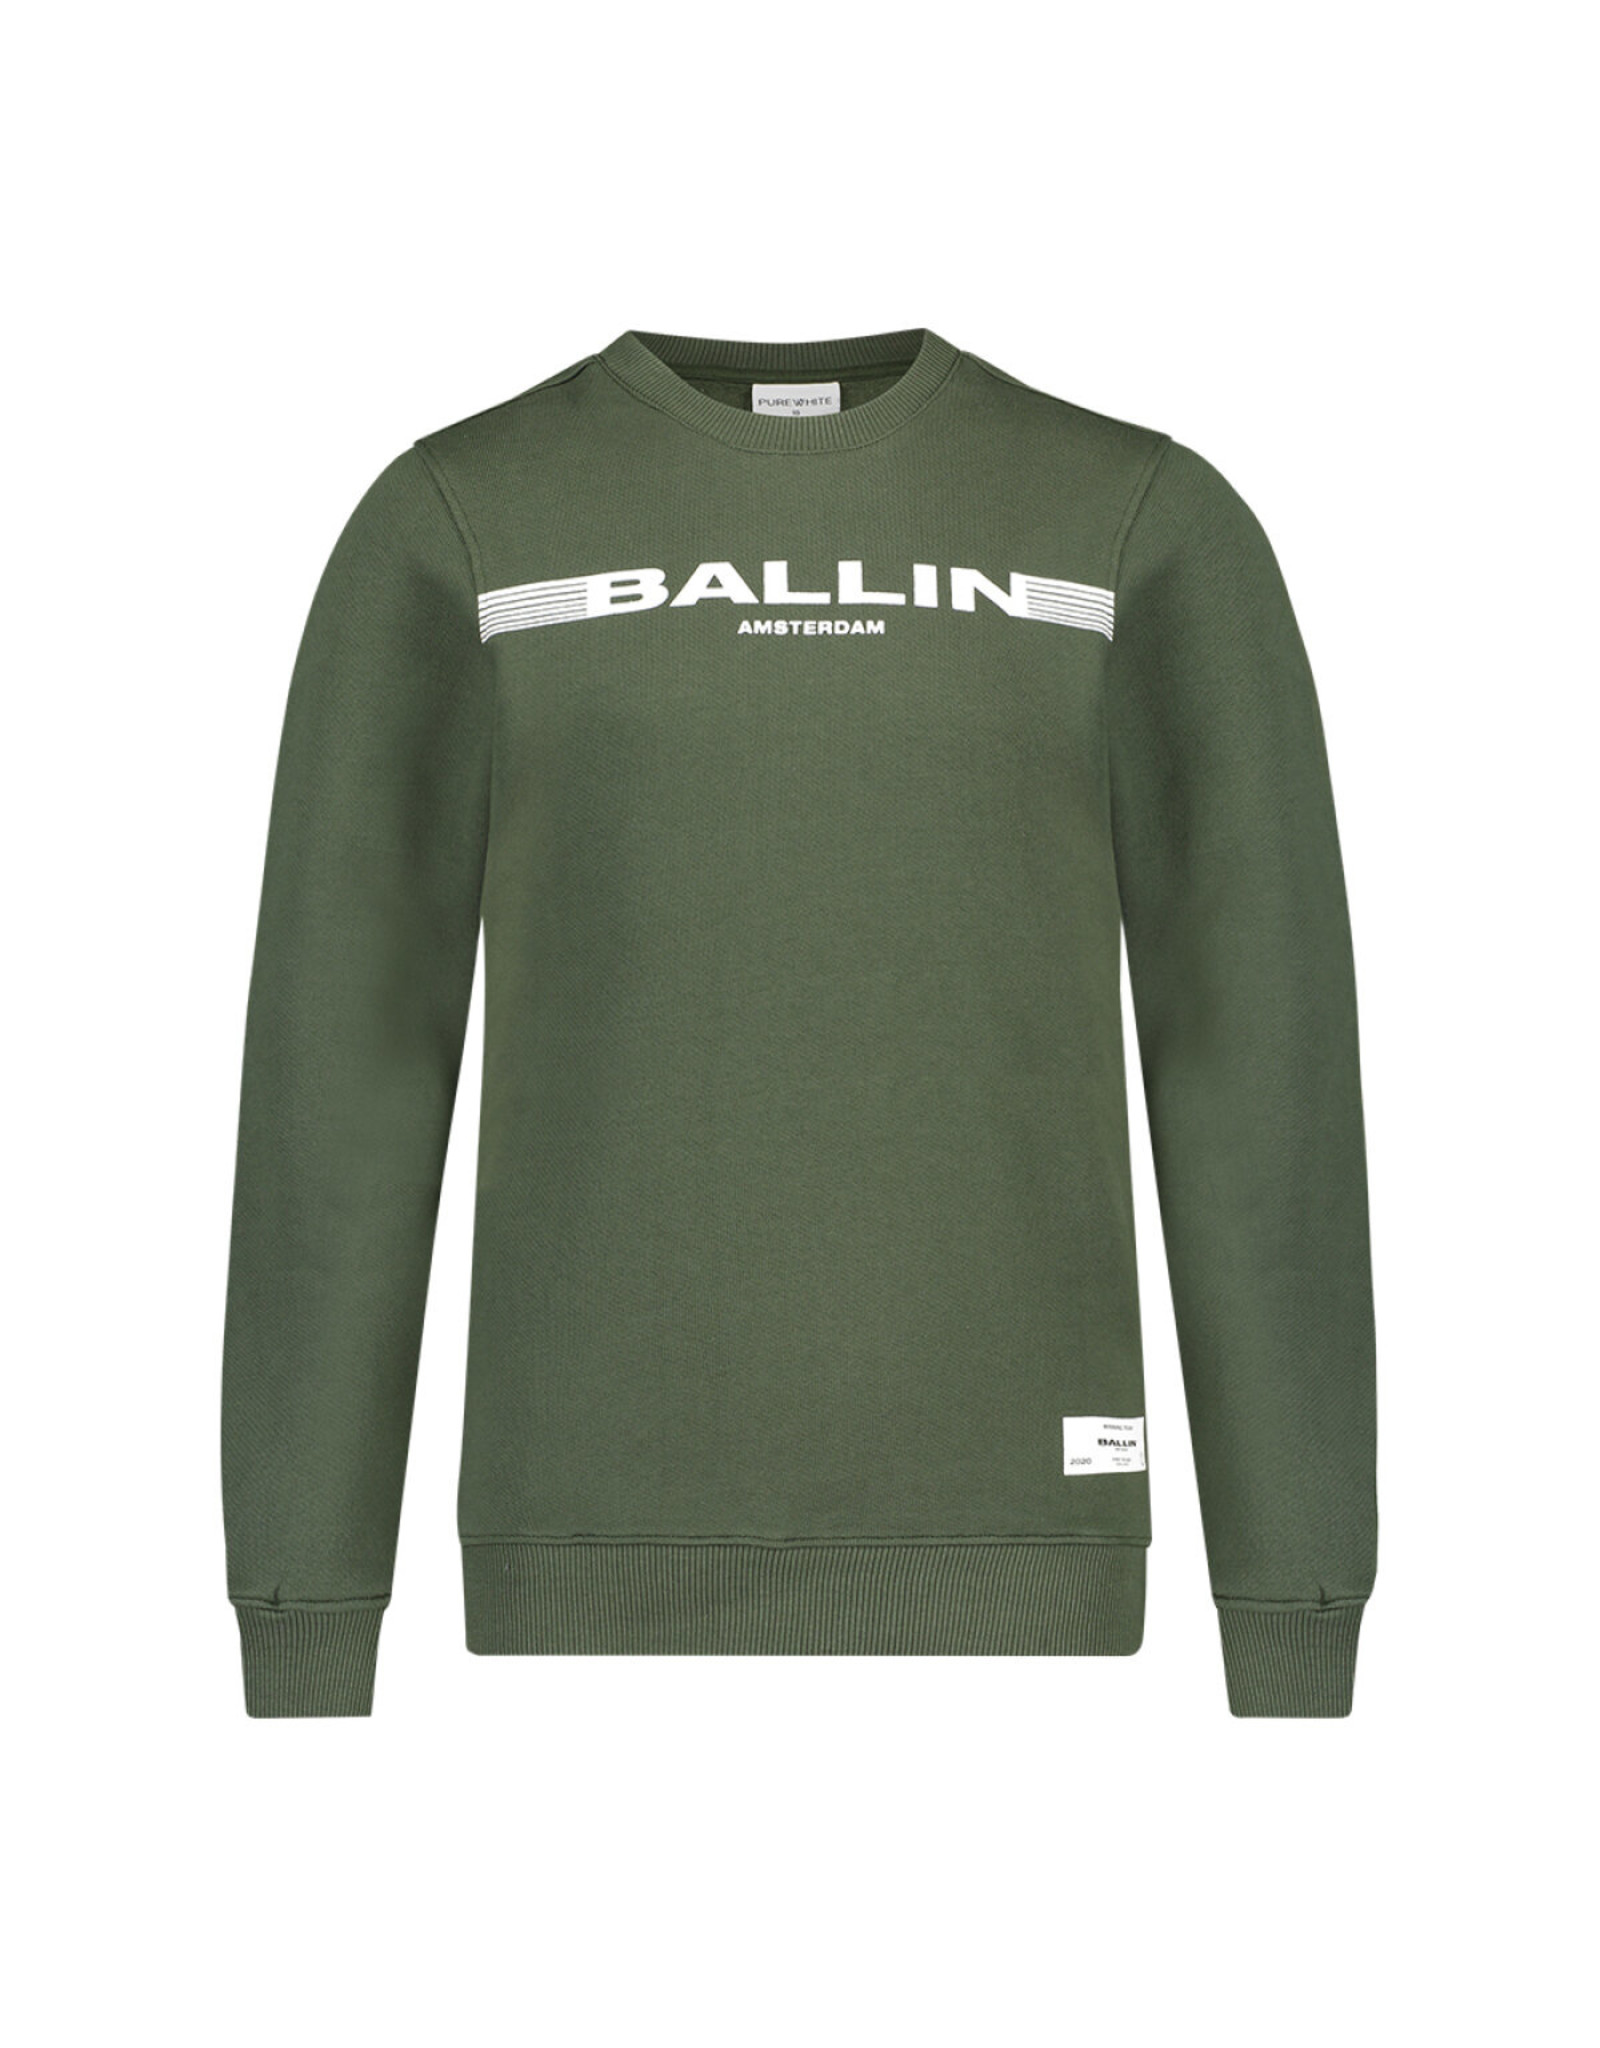 Ballin Amsterdam Sweater Dark Army